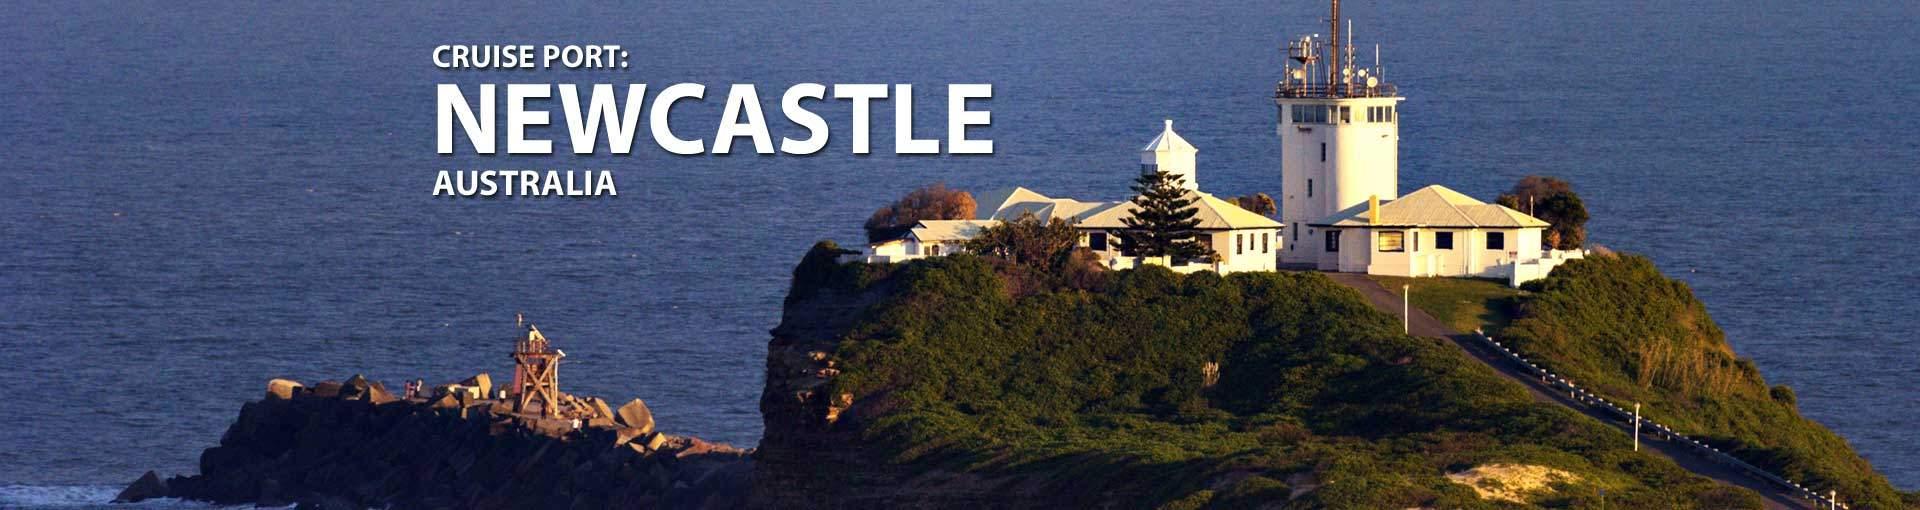 Cruises to Newcastle, Australia